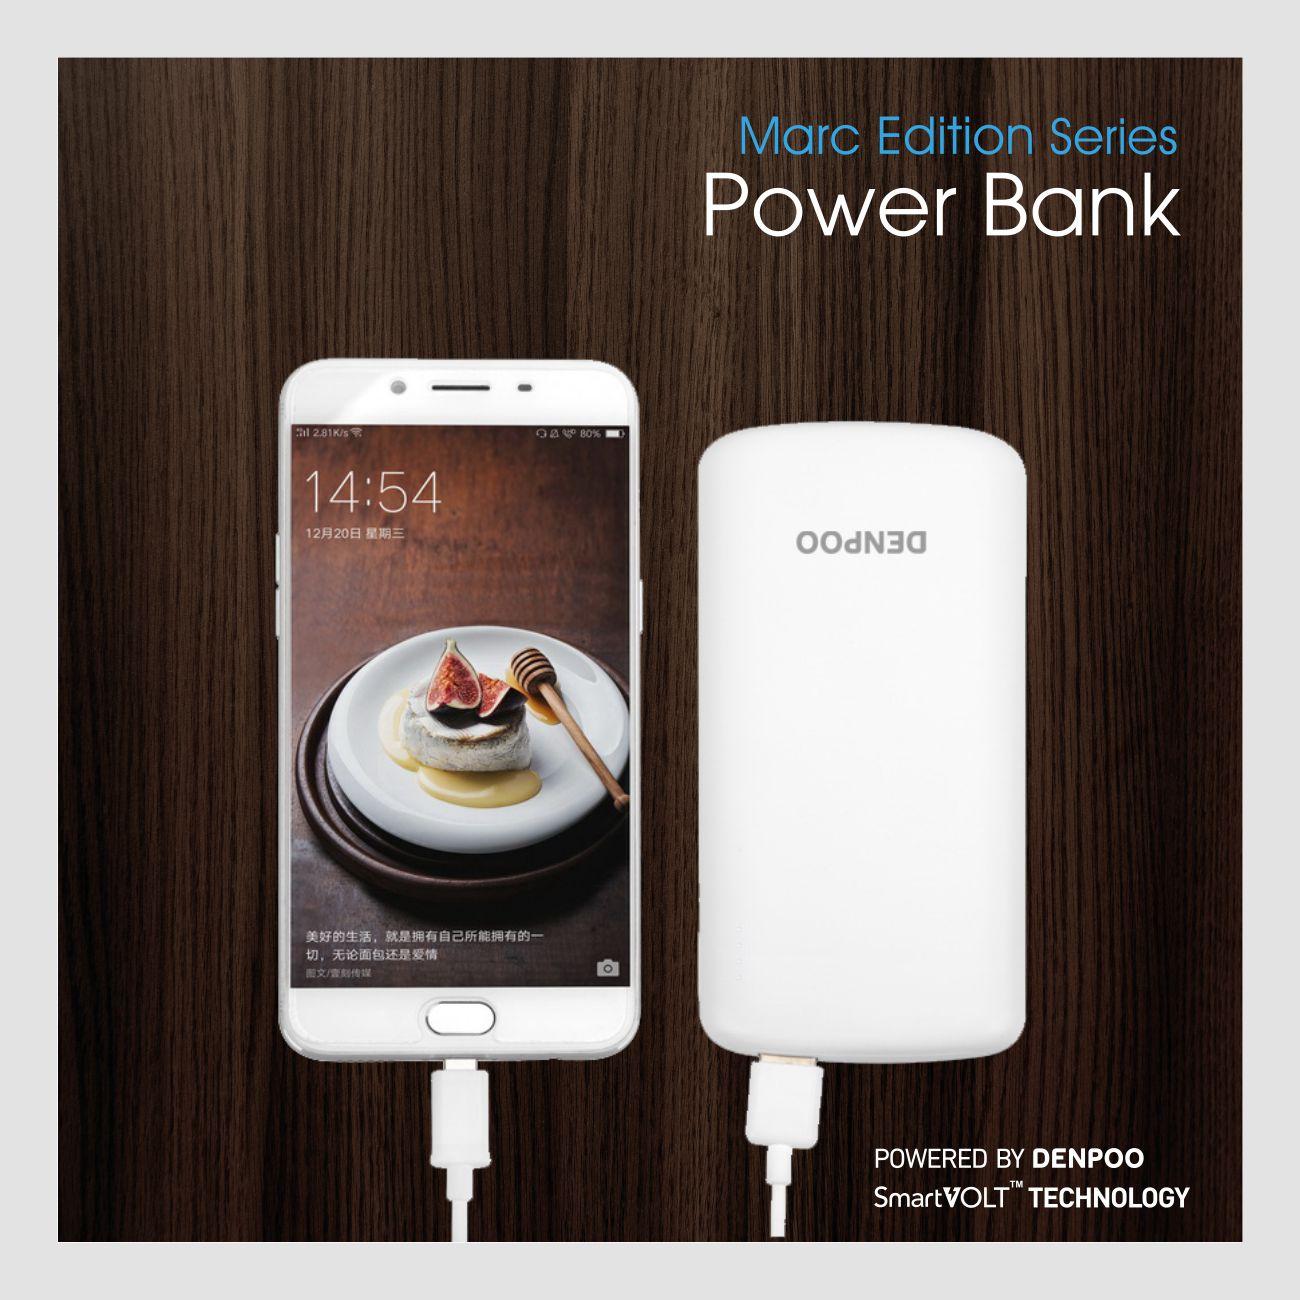 PowerBank (Marc Edition) 2